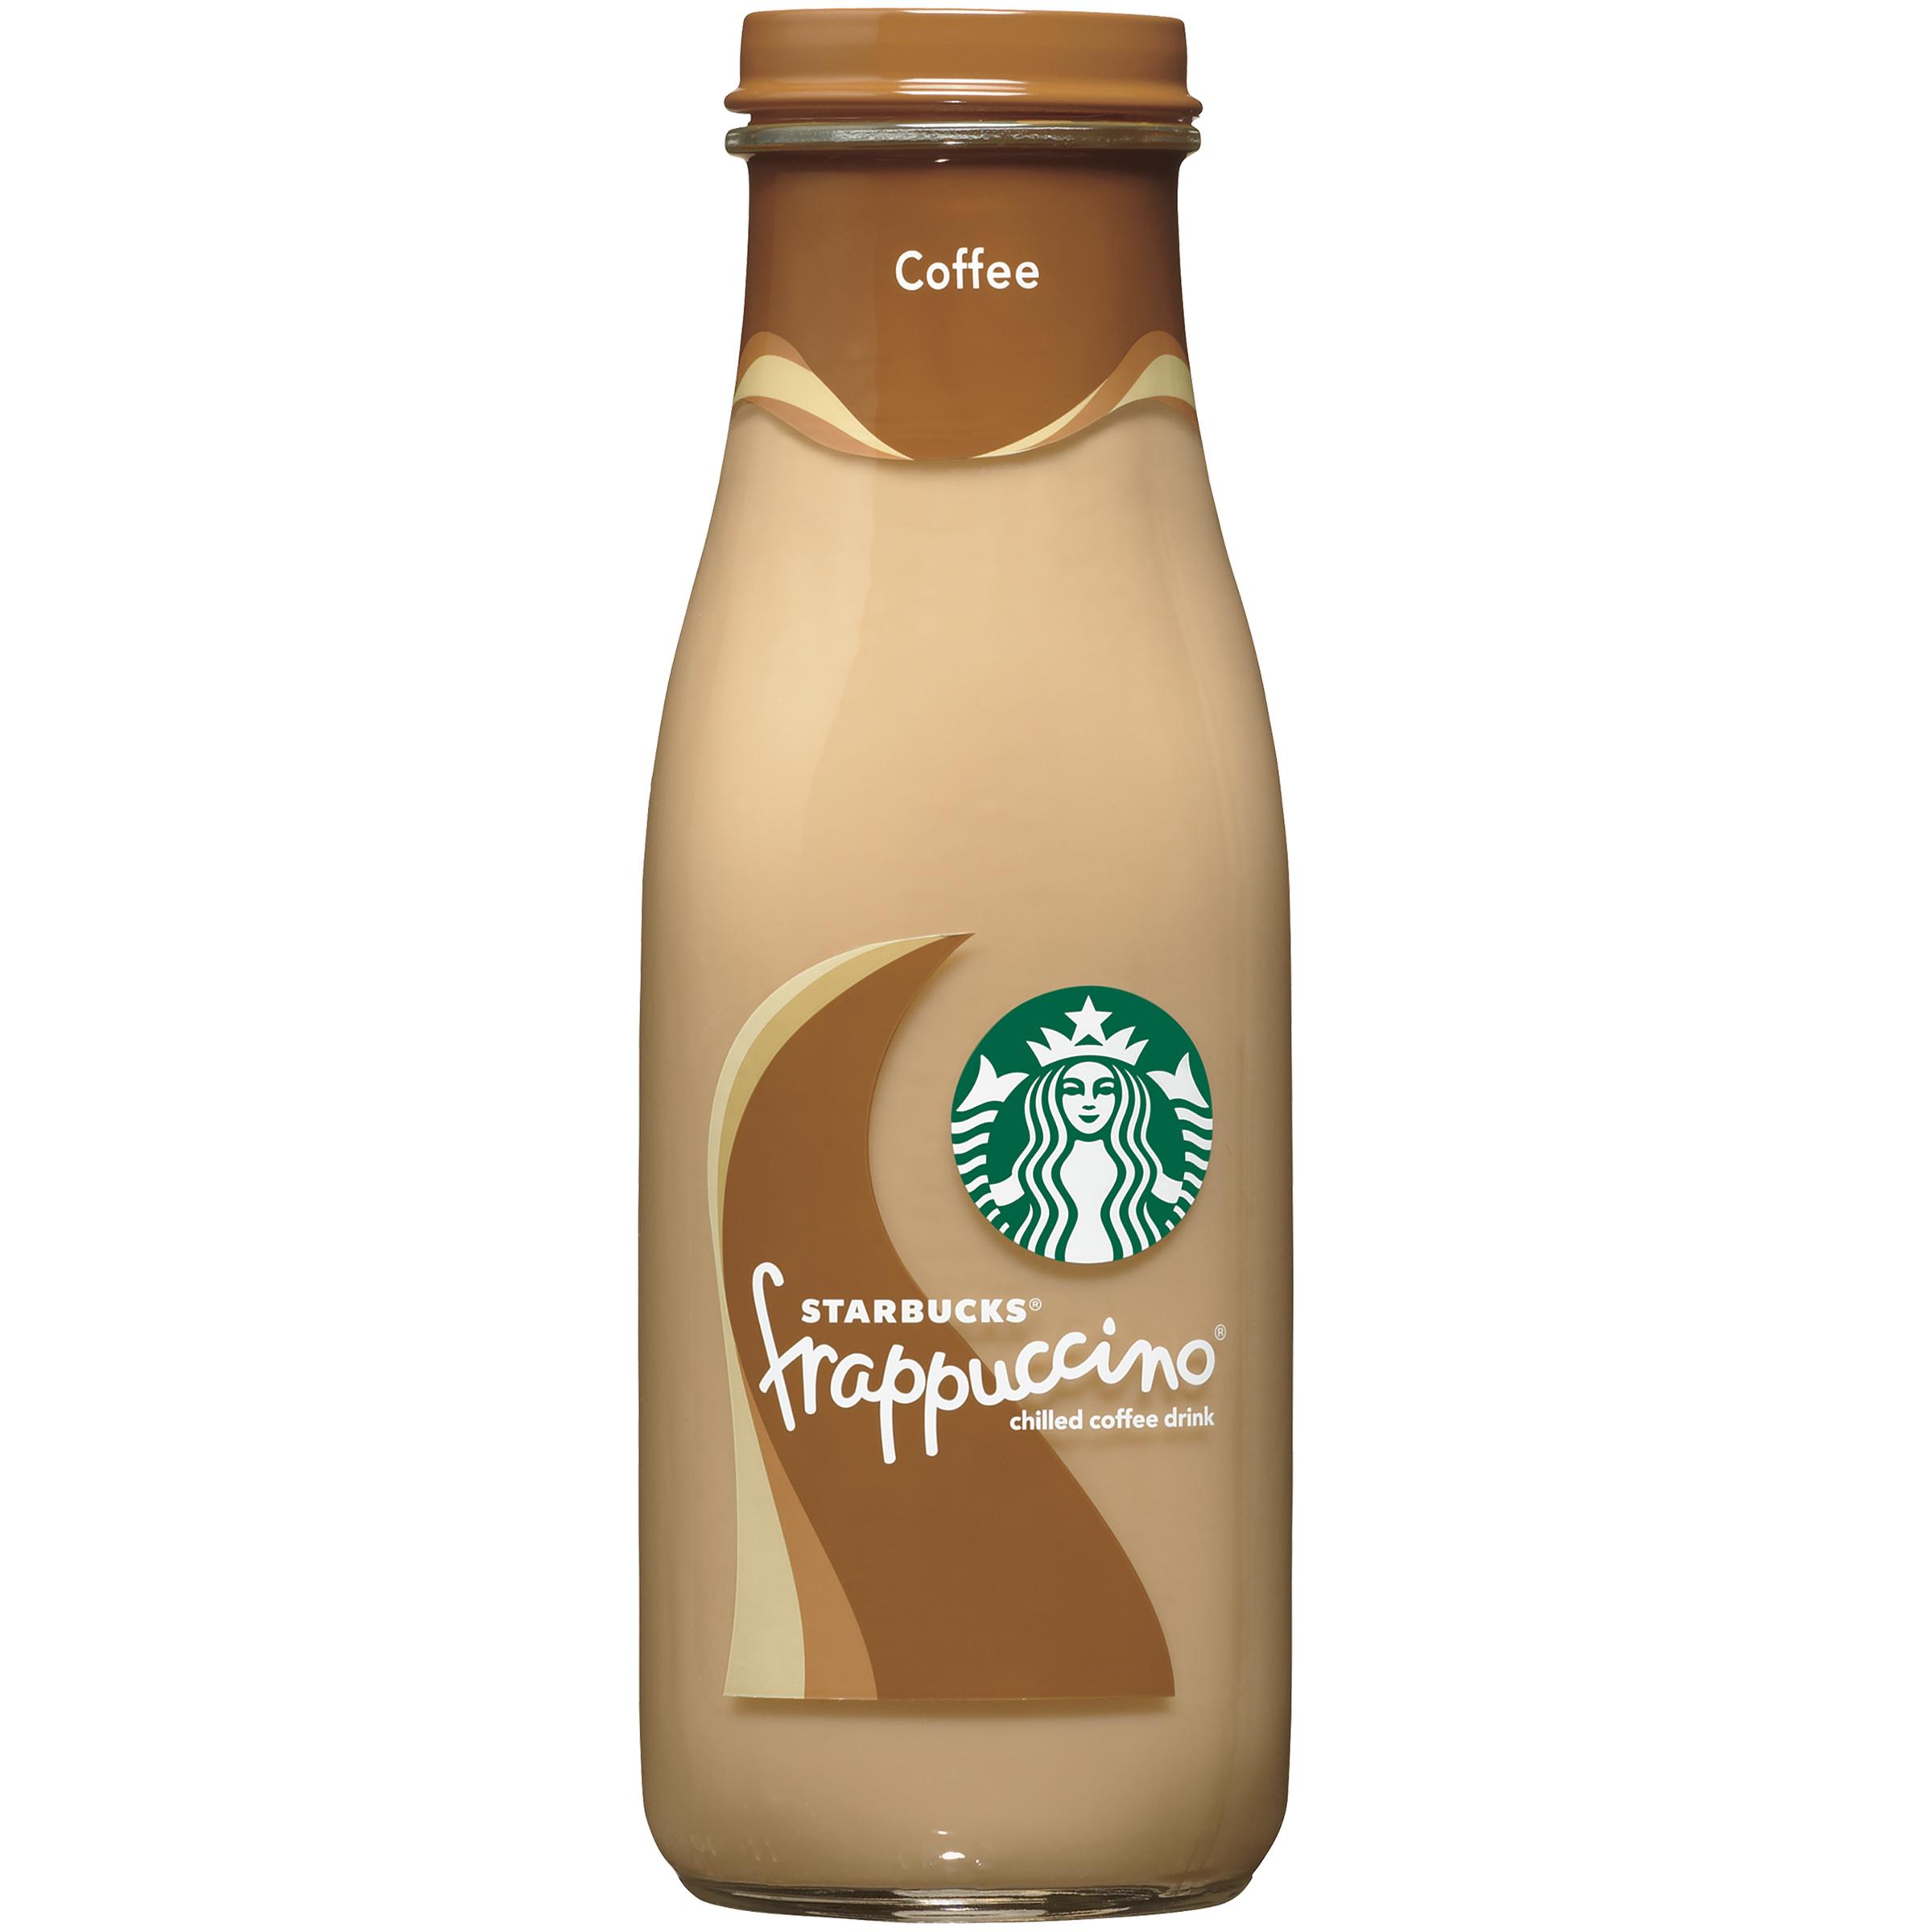 Starbucks® Frappuccino® Chilled Coffee Drink 13.7 fl. oz. Bottle